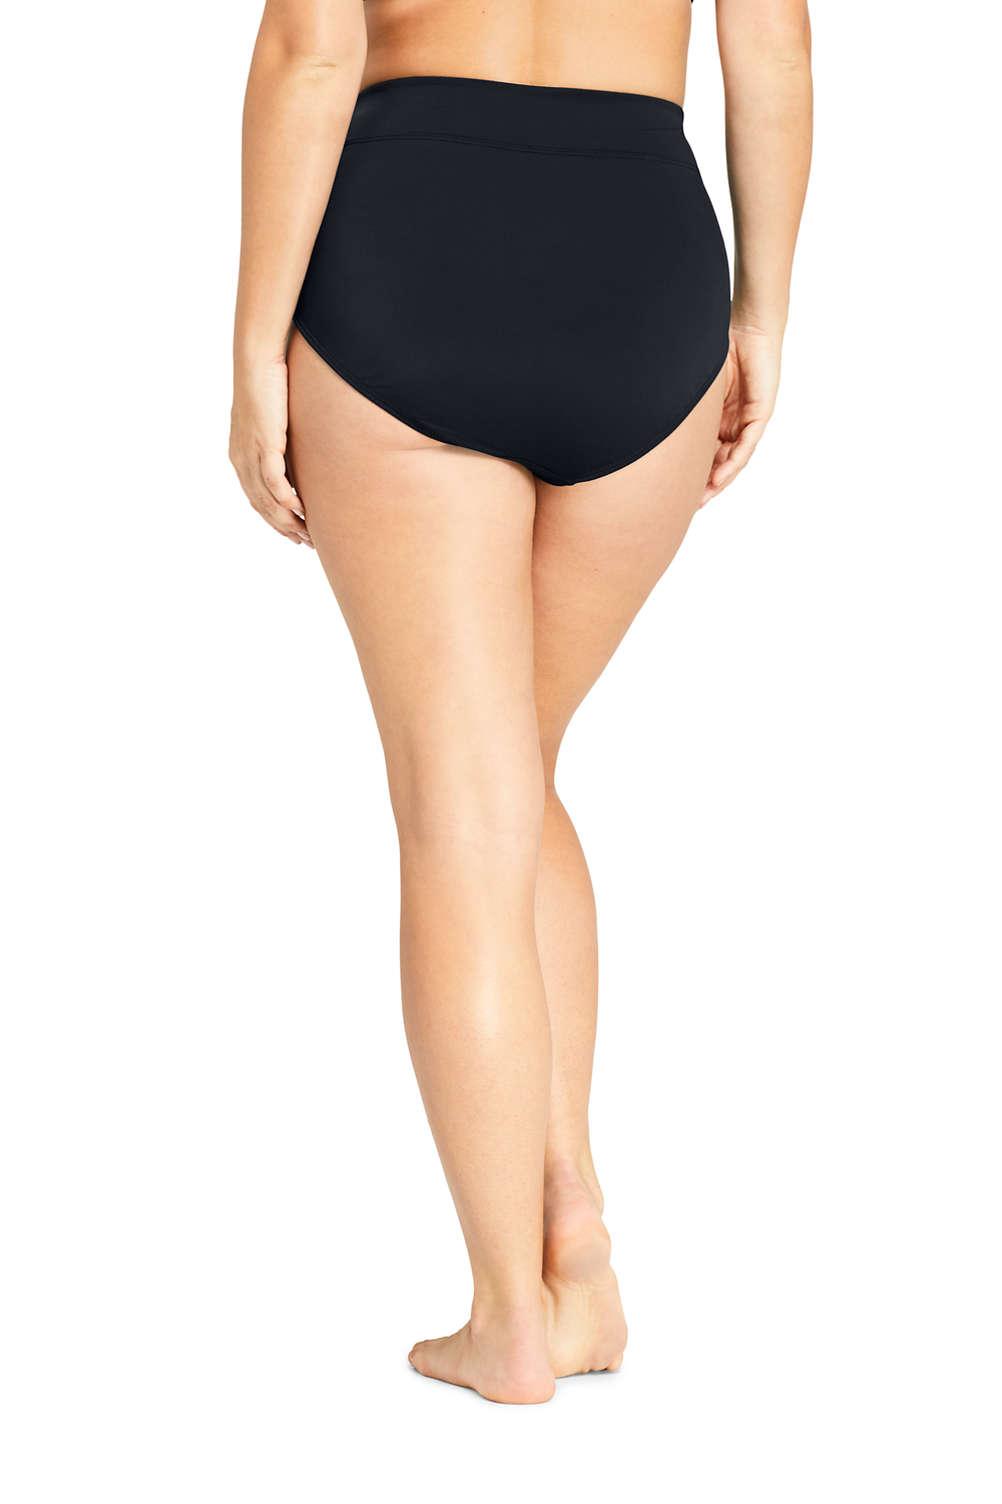 eca7593980 Women s Chlorine Resistant Plus Size High Waisted Bikini Bottoms ...